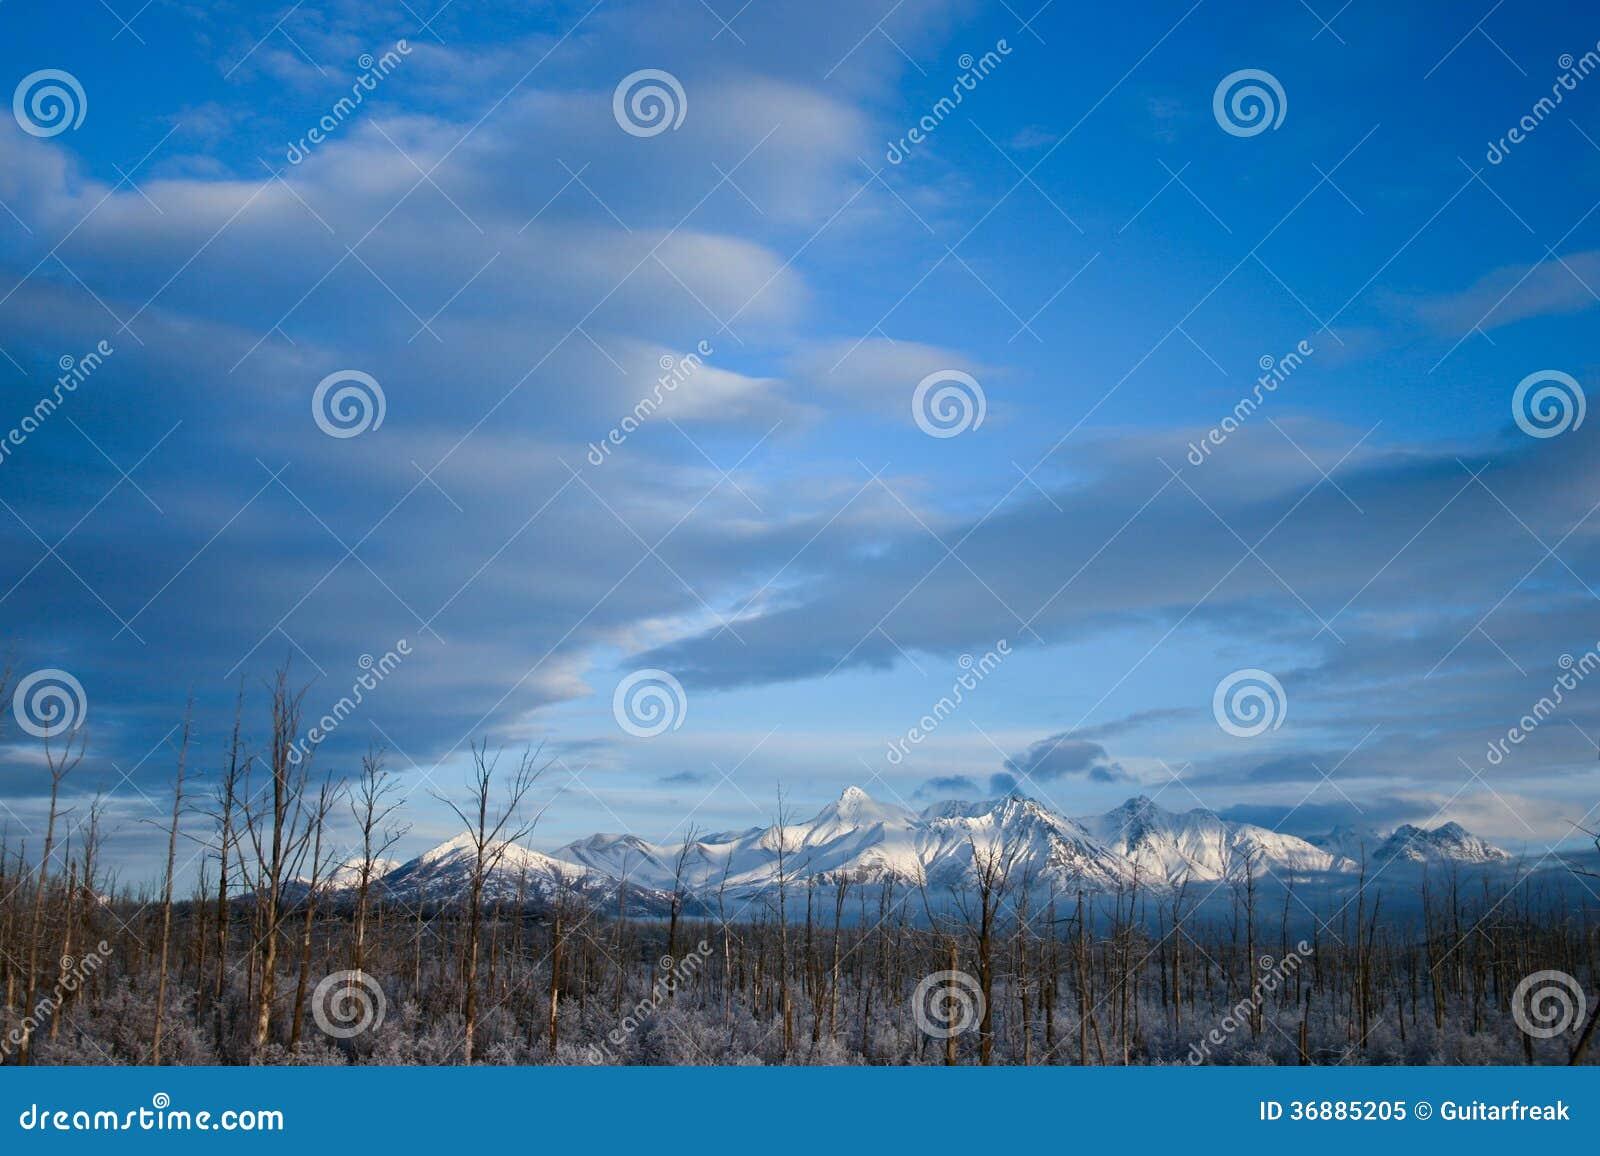 Download Montagne d'Alasca in neve immagine stock. Immagine di neve - 36885205